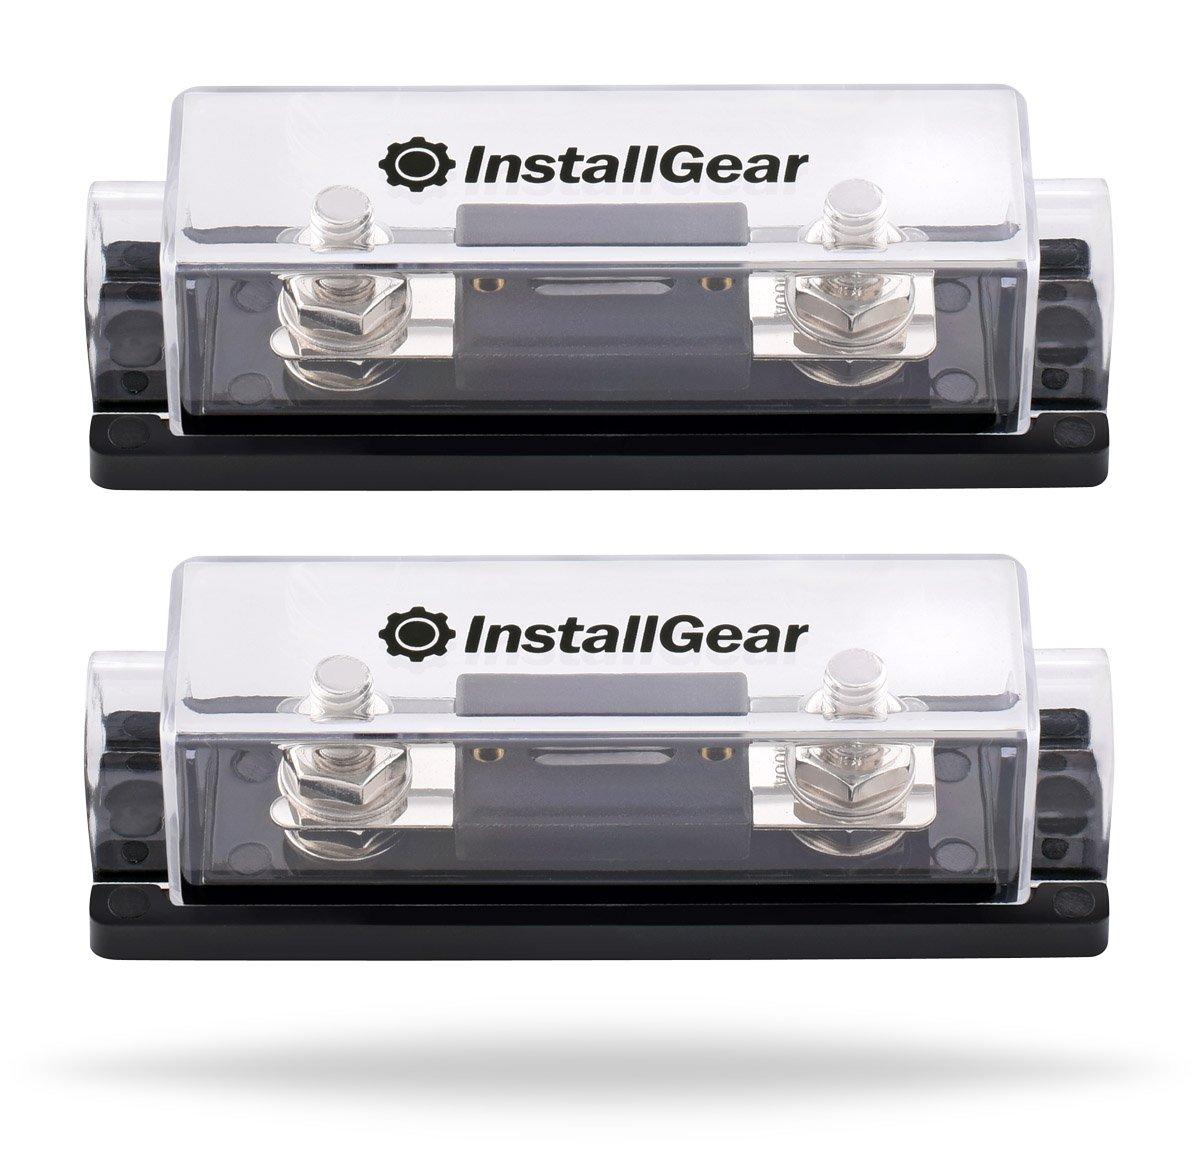 Installgear 0 2 4 Gauge Ga Anl Fuse Holder 250 Amp Ac Box Handles Fuses Pack Automotive